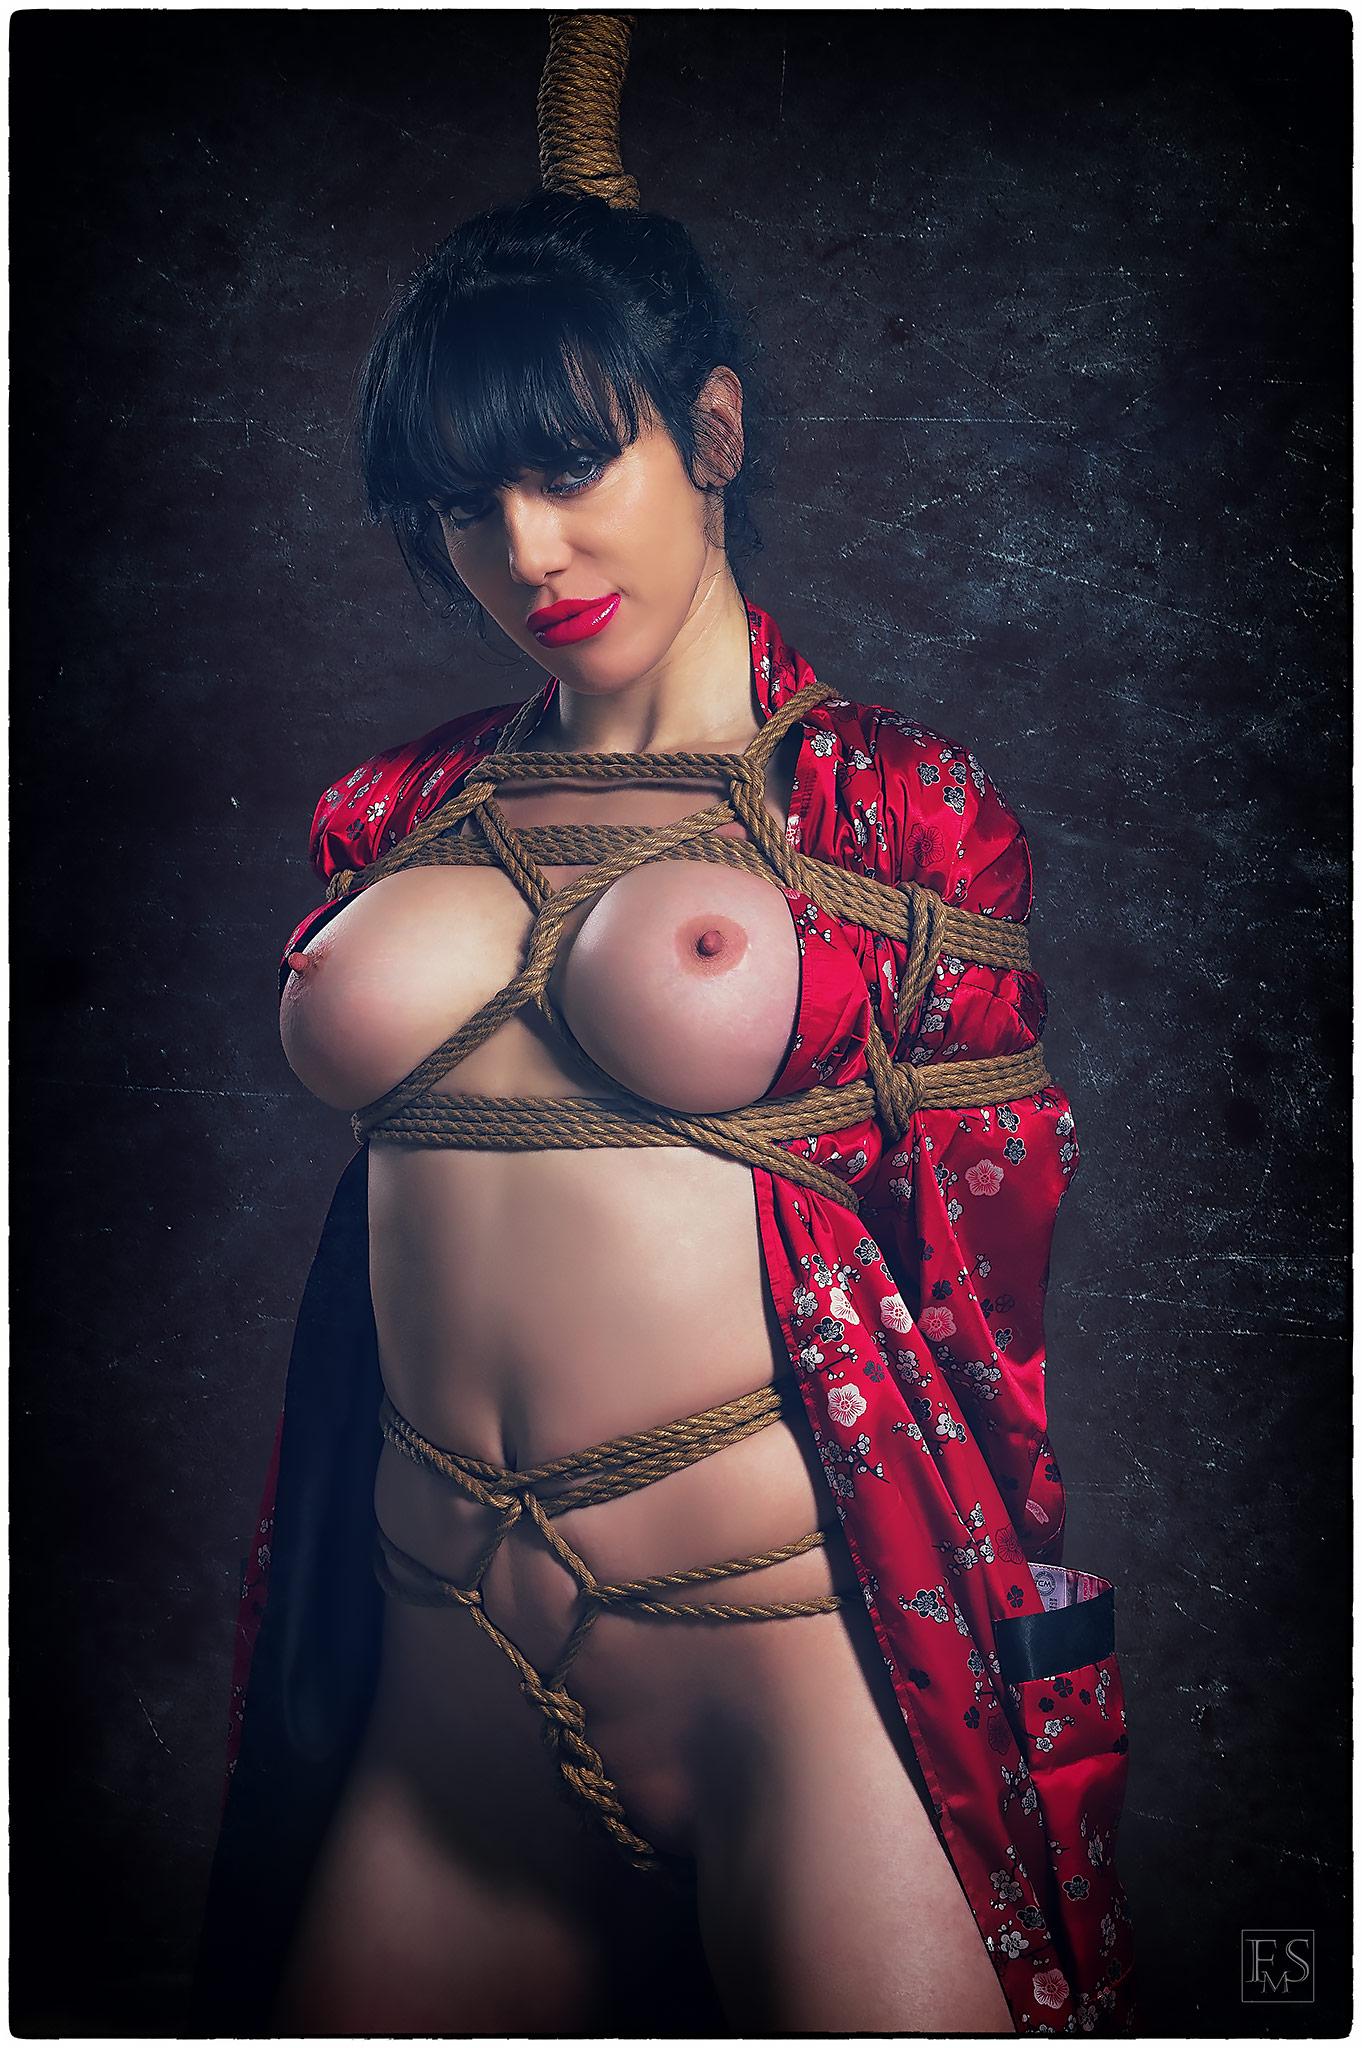 Shibari Red